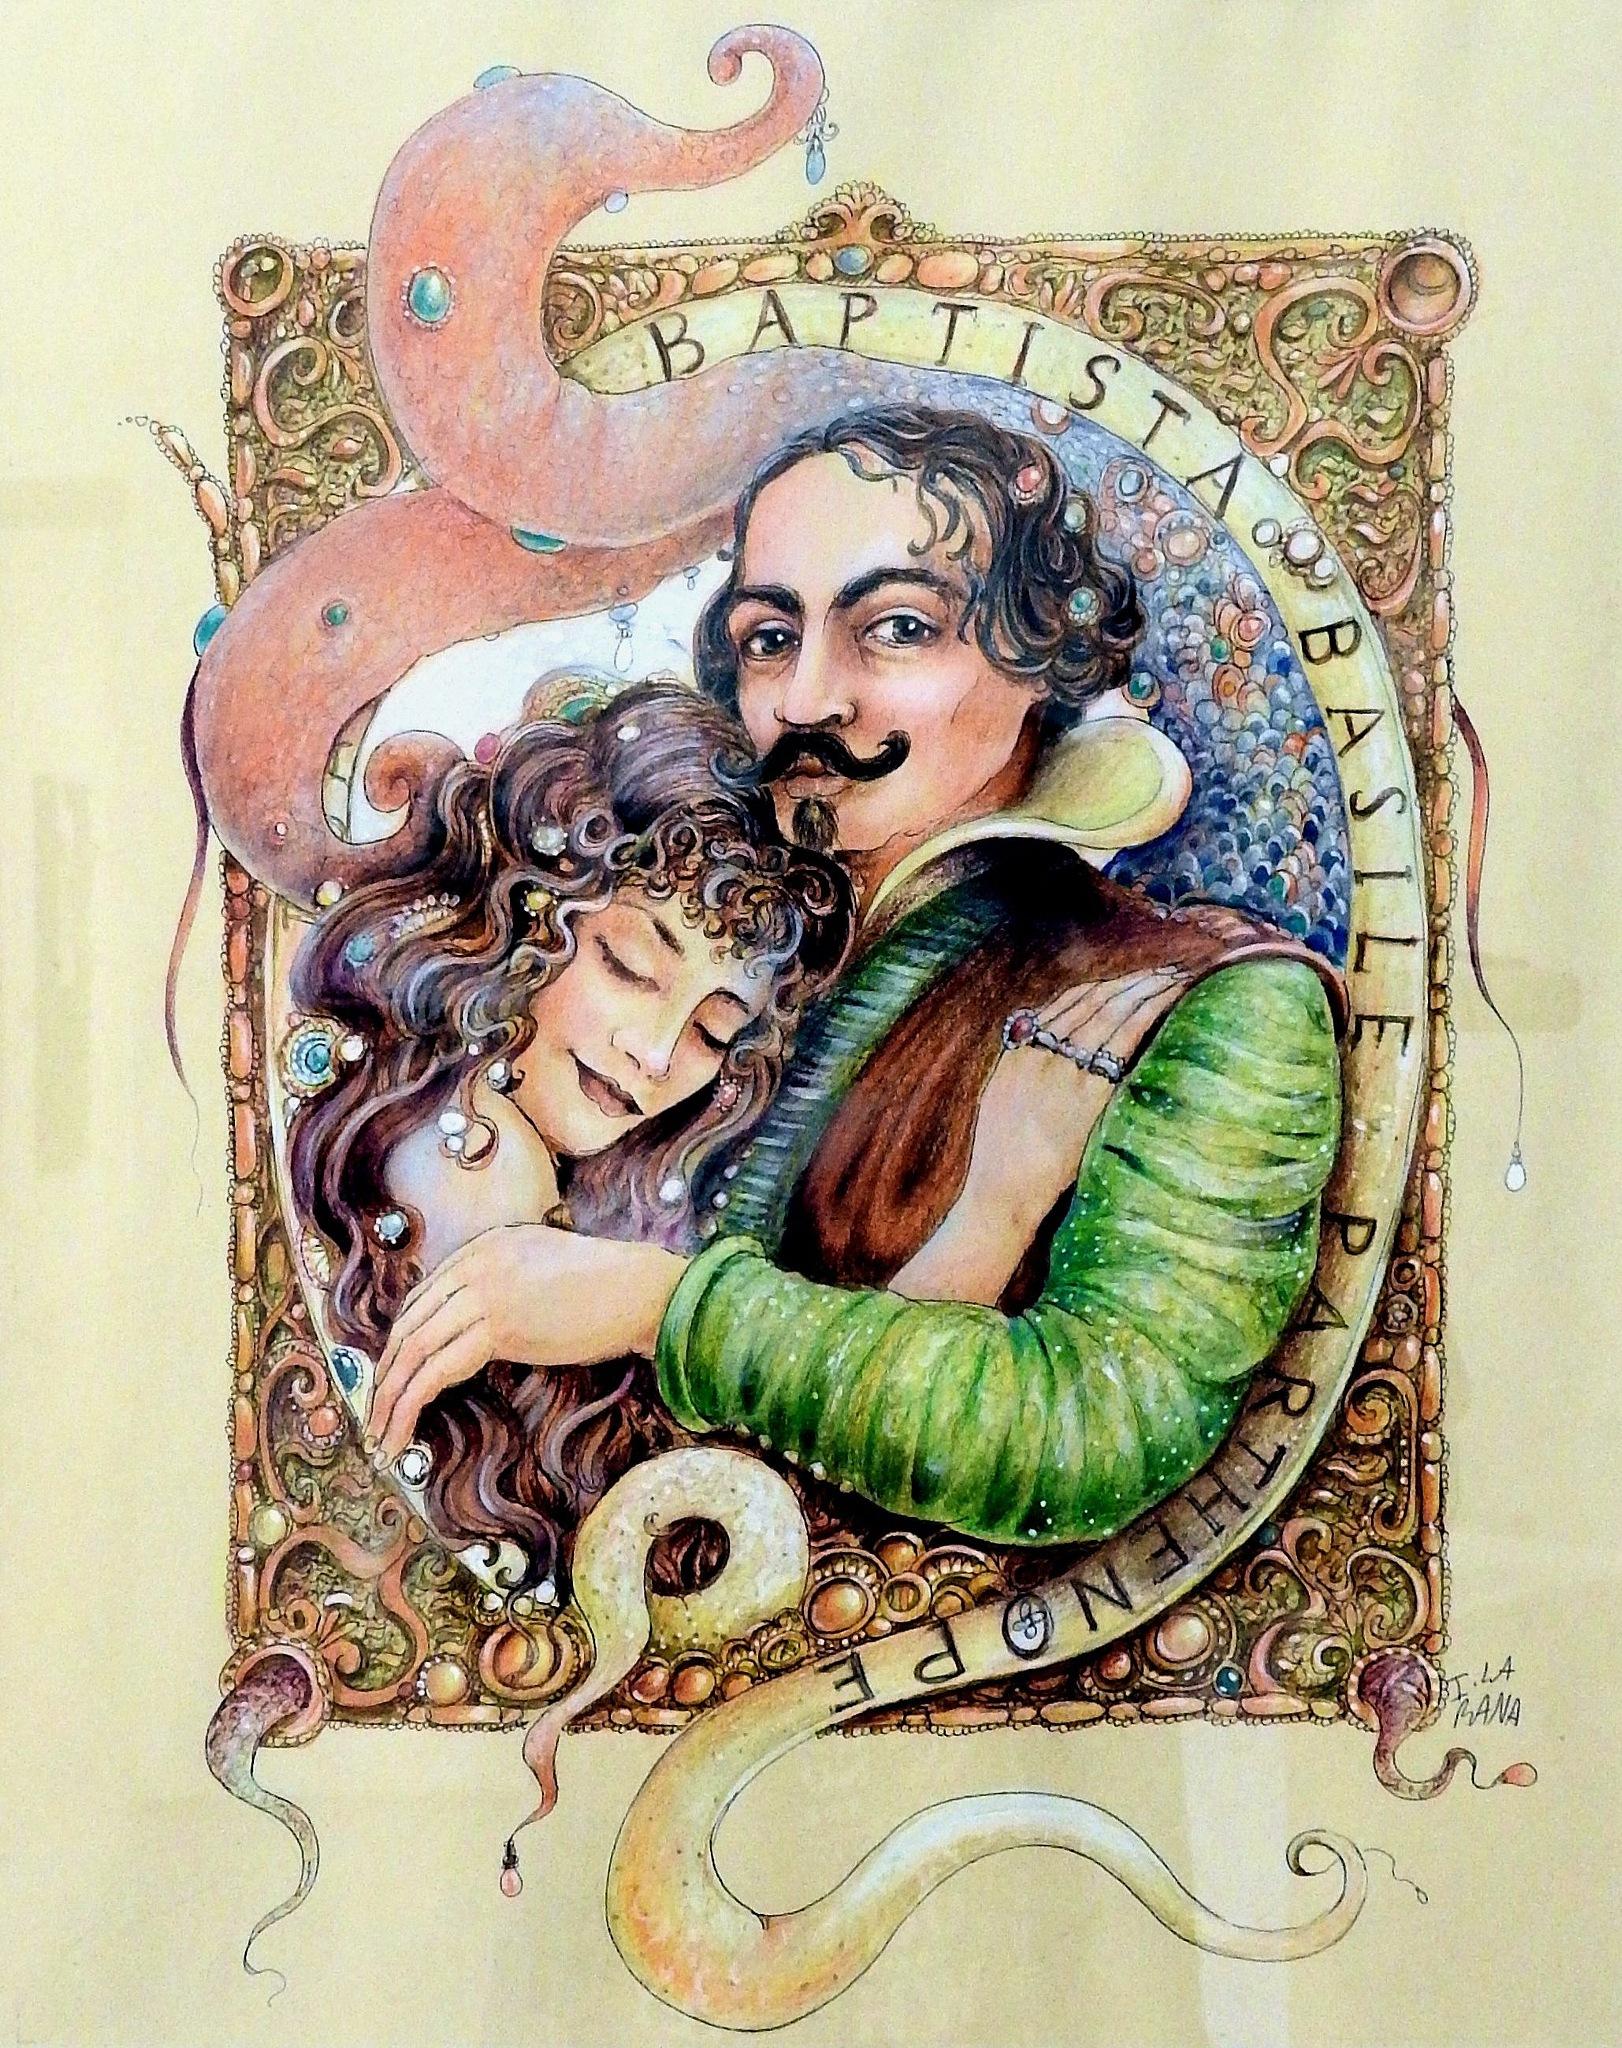 Ida La Rana - G.B. Basile e Partenope - P.A.N. Napoli - Napoli Expo' Art Polis  by Arnaldo De Lisio